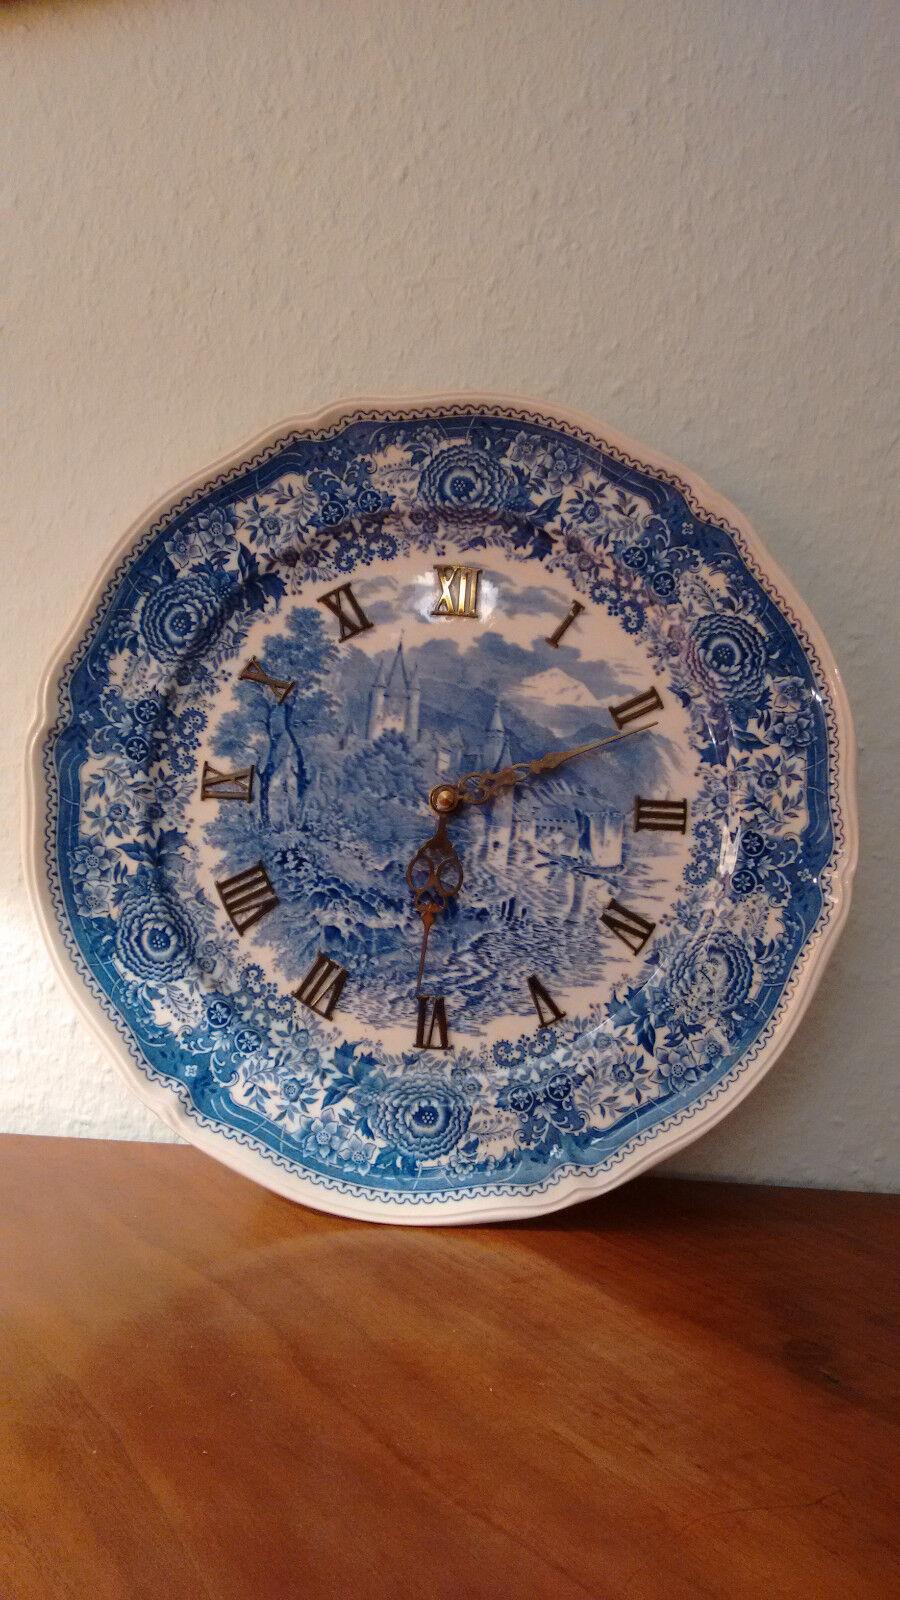 Junghans Küchenwanduhr, Keramik bemalt, Landschaftsmotiv